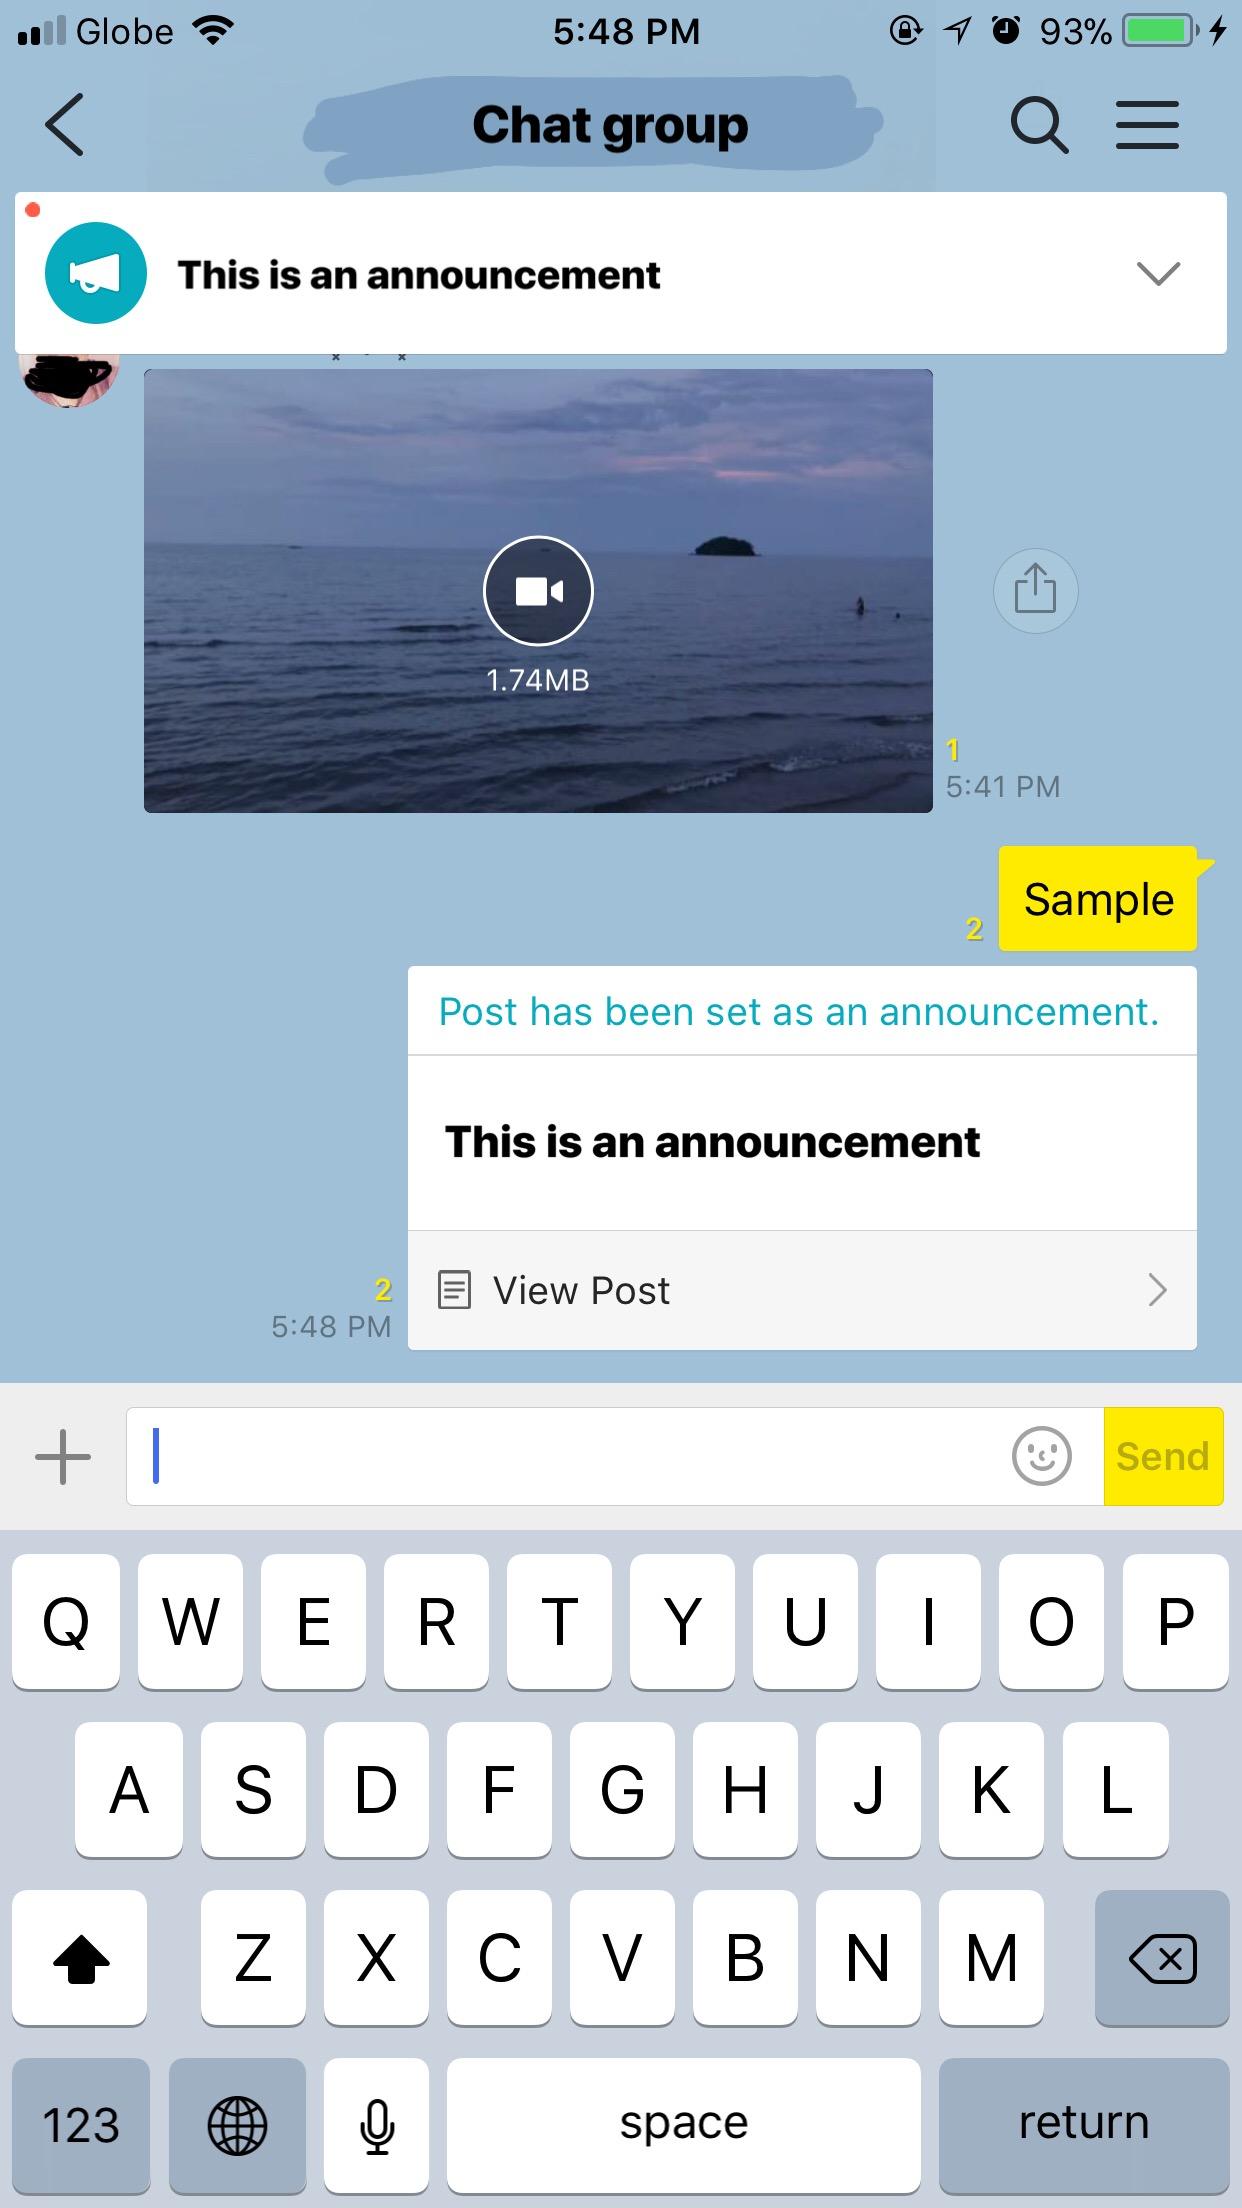 Chat app hacks for those careless messages you regret - NOLISOLI